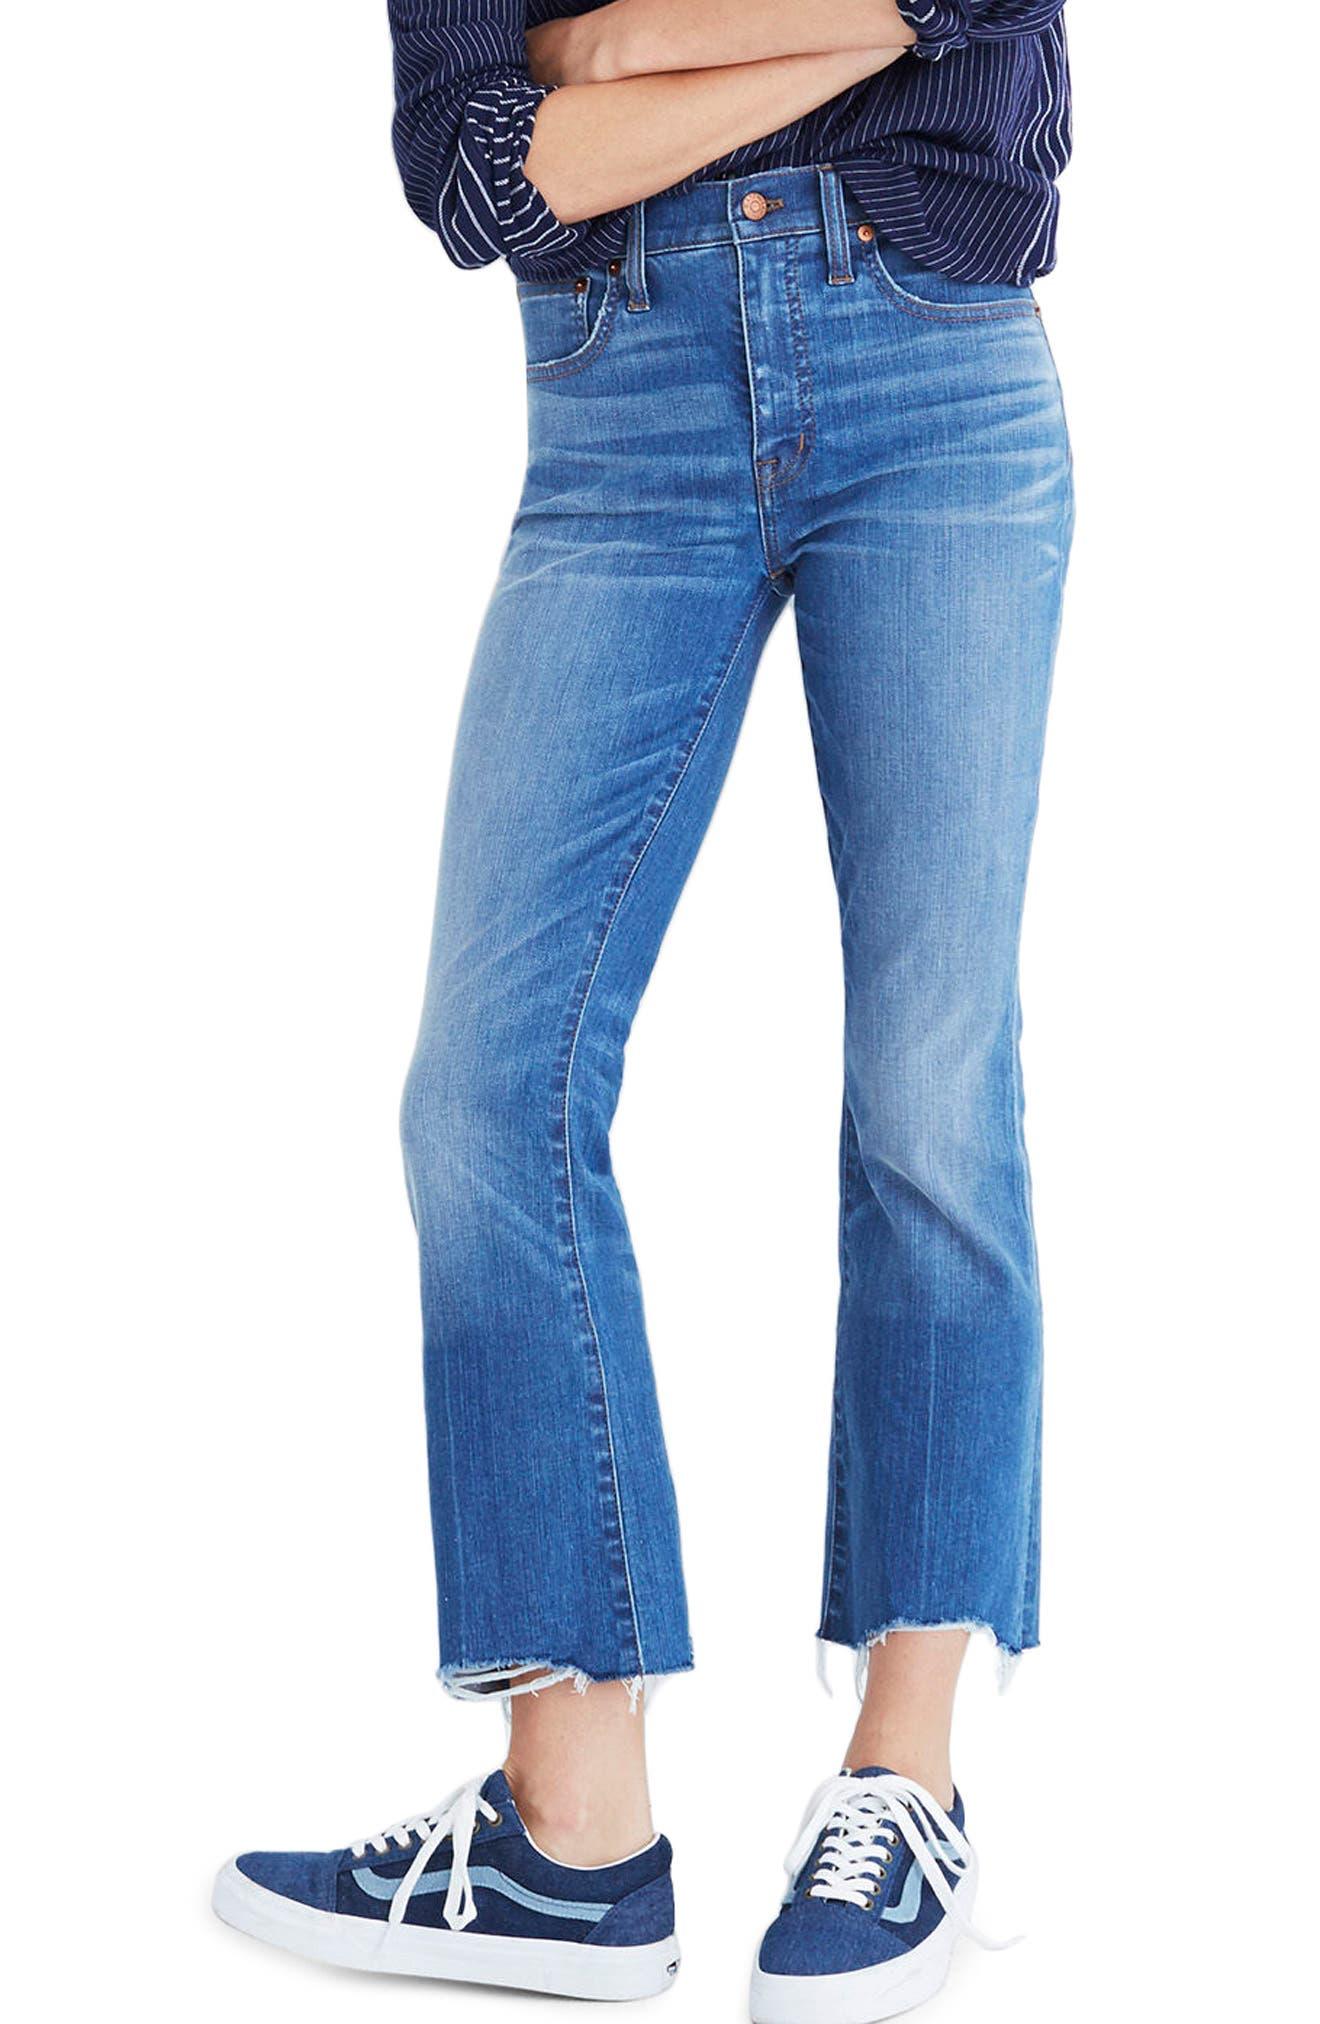 Cali Demi Boot Jeans,                         Main,                         color, Haywood Wash